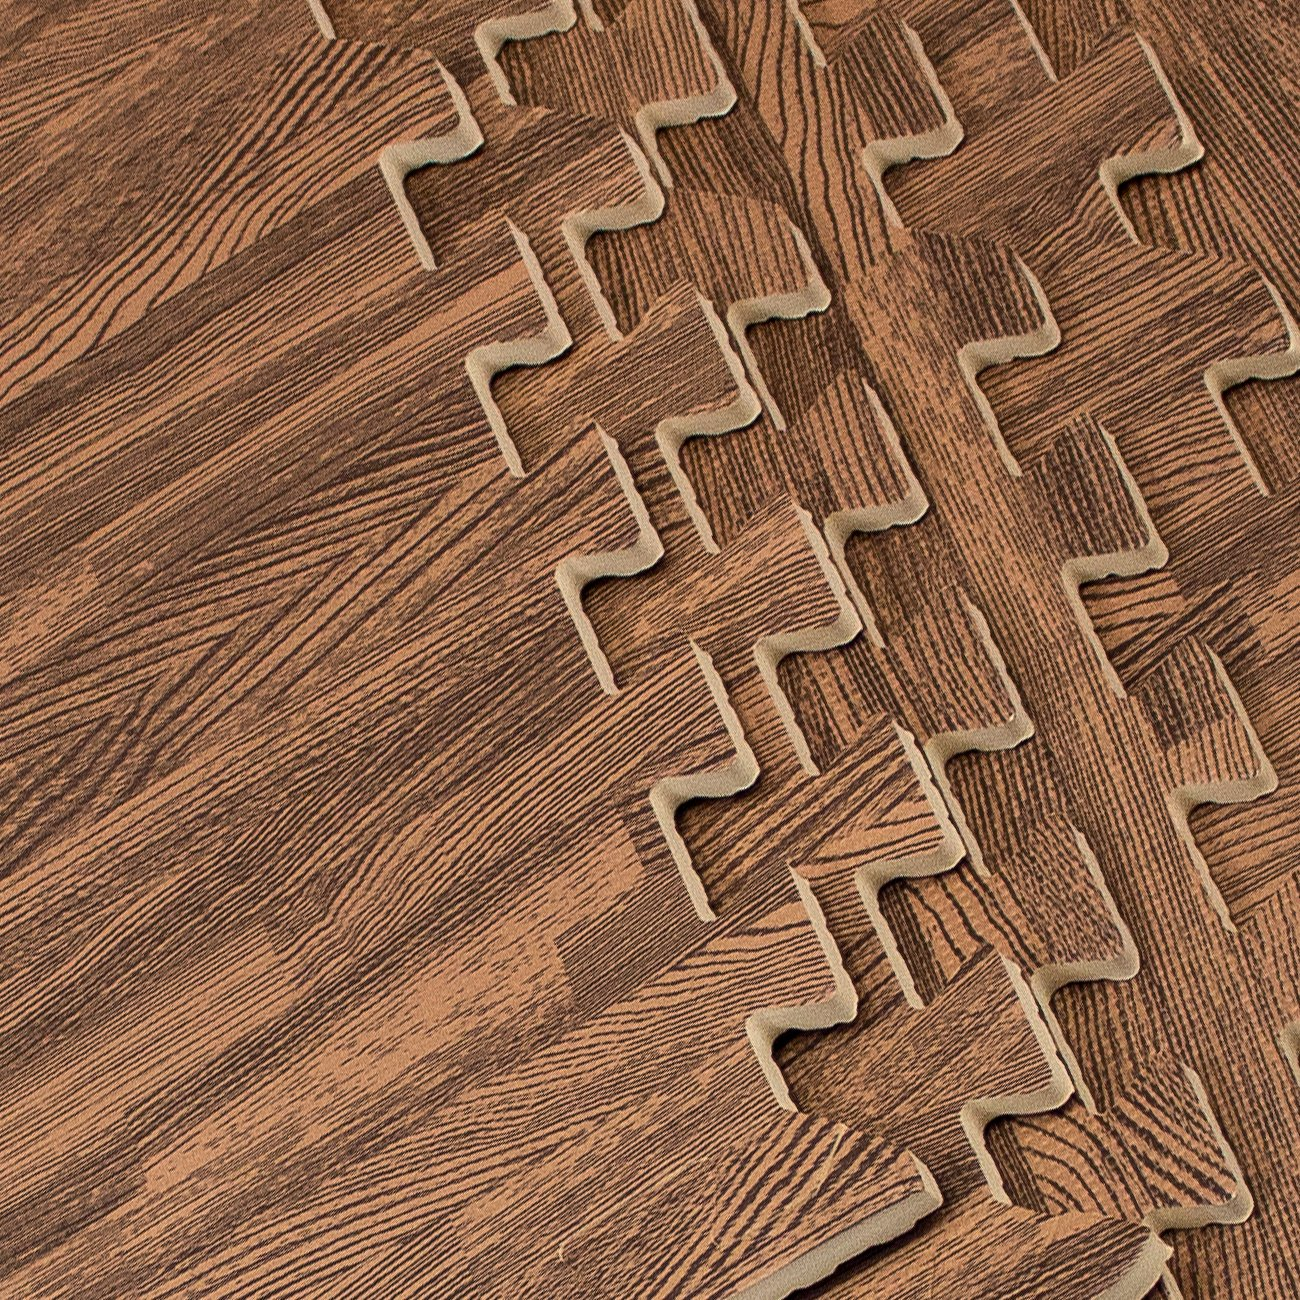 Sorbus Interlocking Floor Mat Print, Wood Grain - Dark (6-Piece) by Sorbus (Image #8)